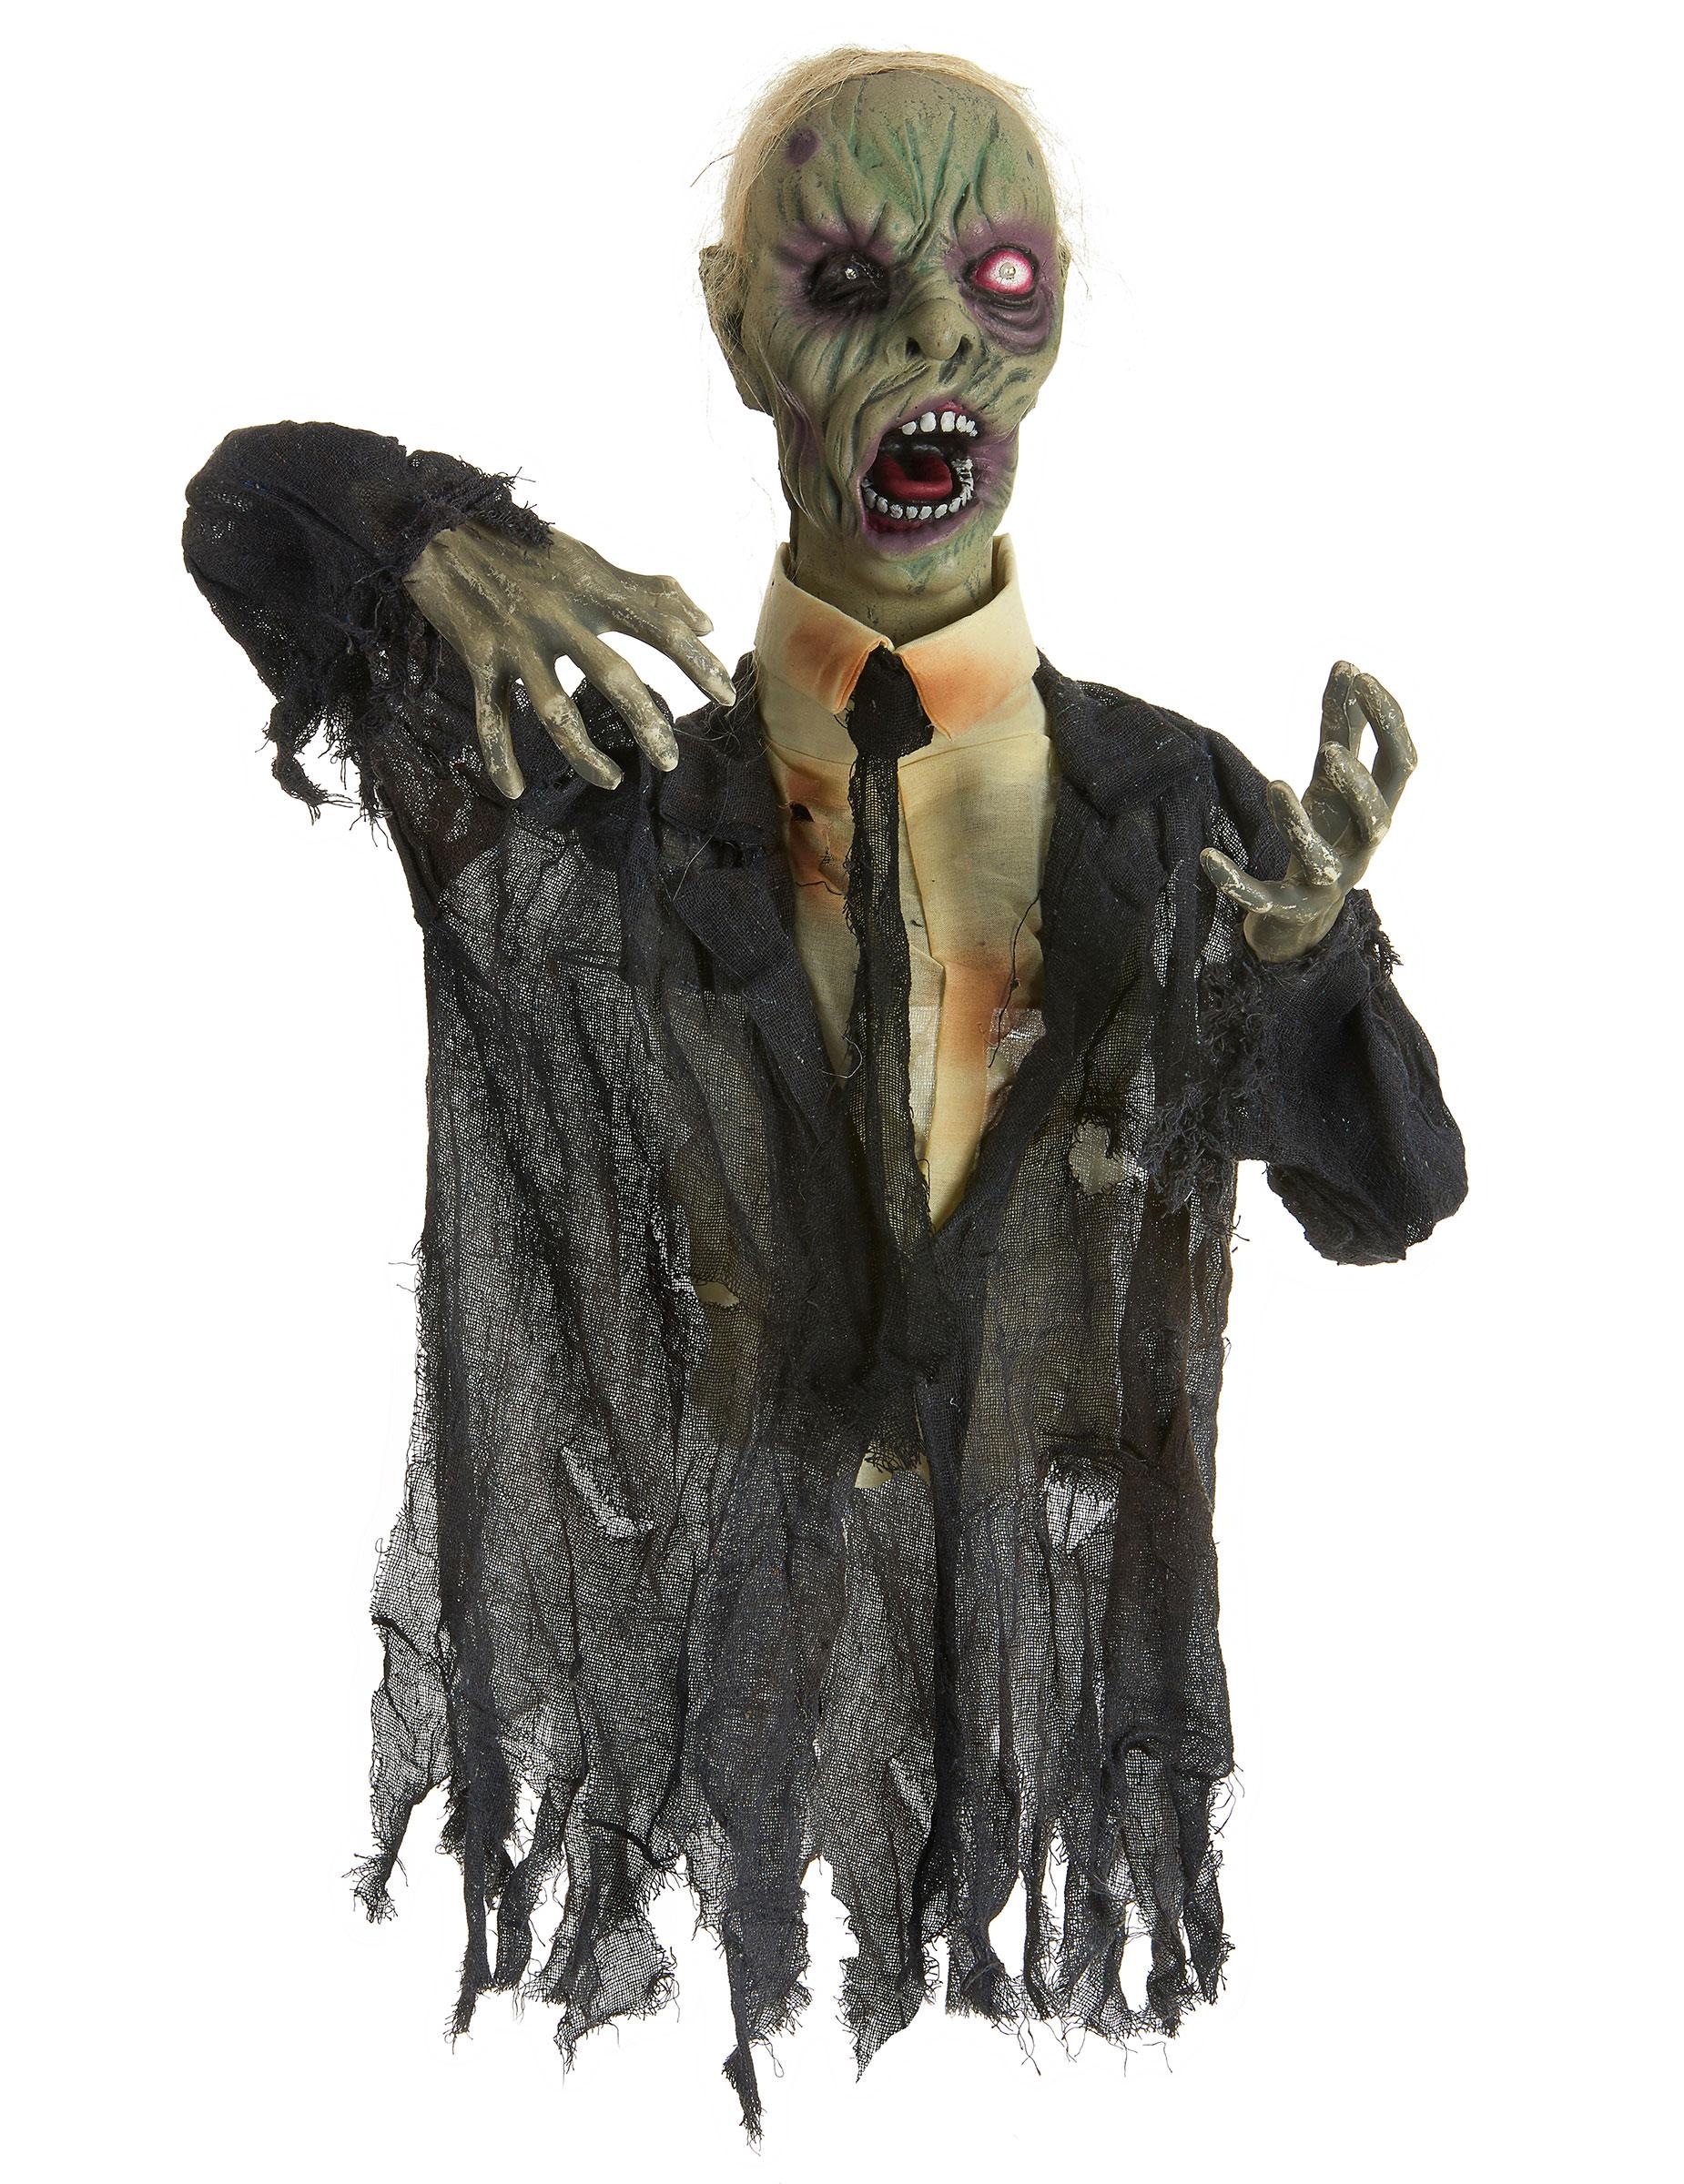 d coration zombie anim e lumineuse et sonore 140 cm halloween d coration an. Black Bedroom Furniture Sets. Home Design Ideas